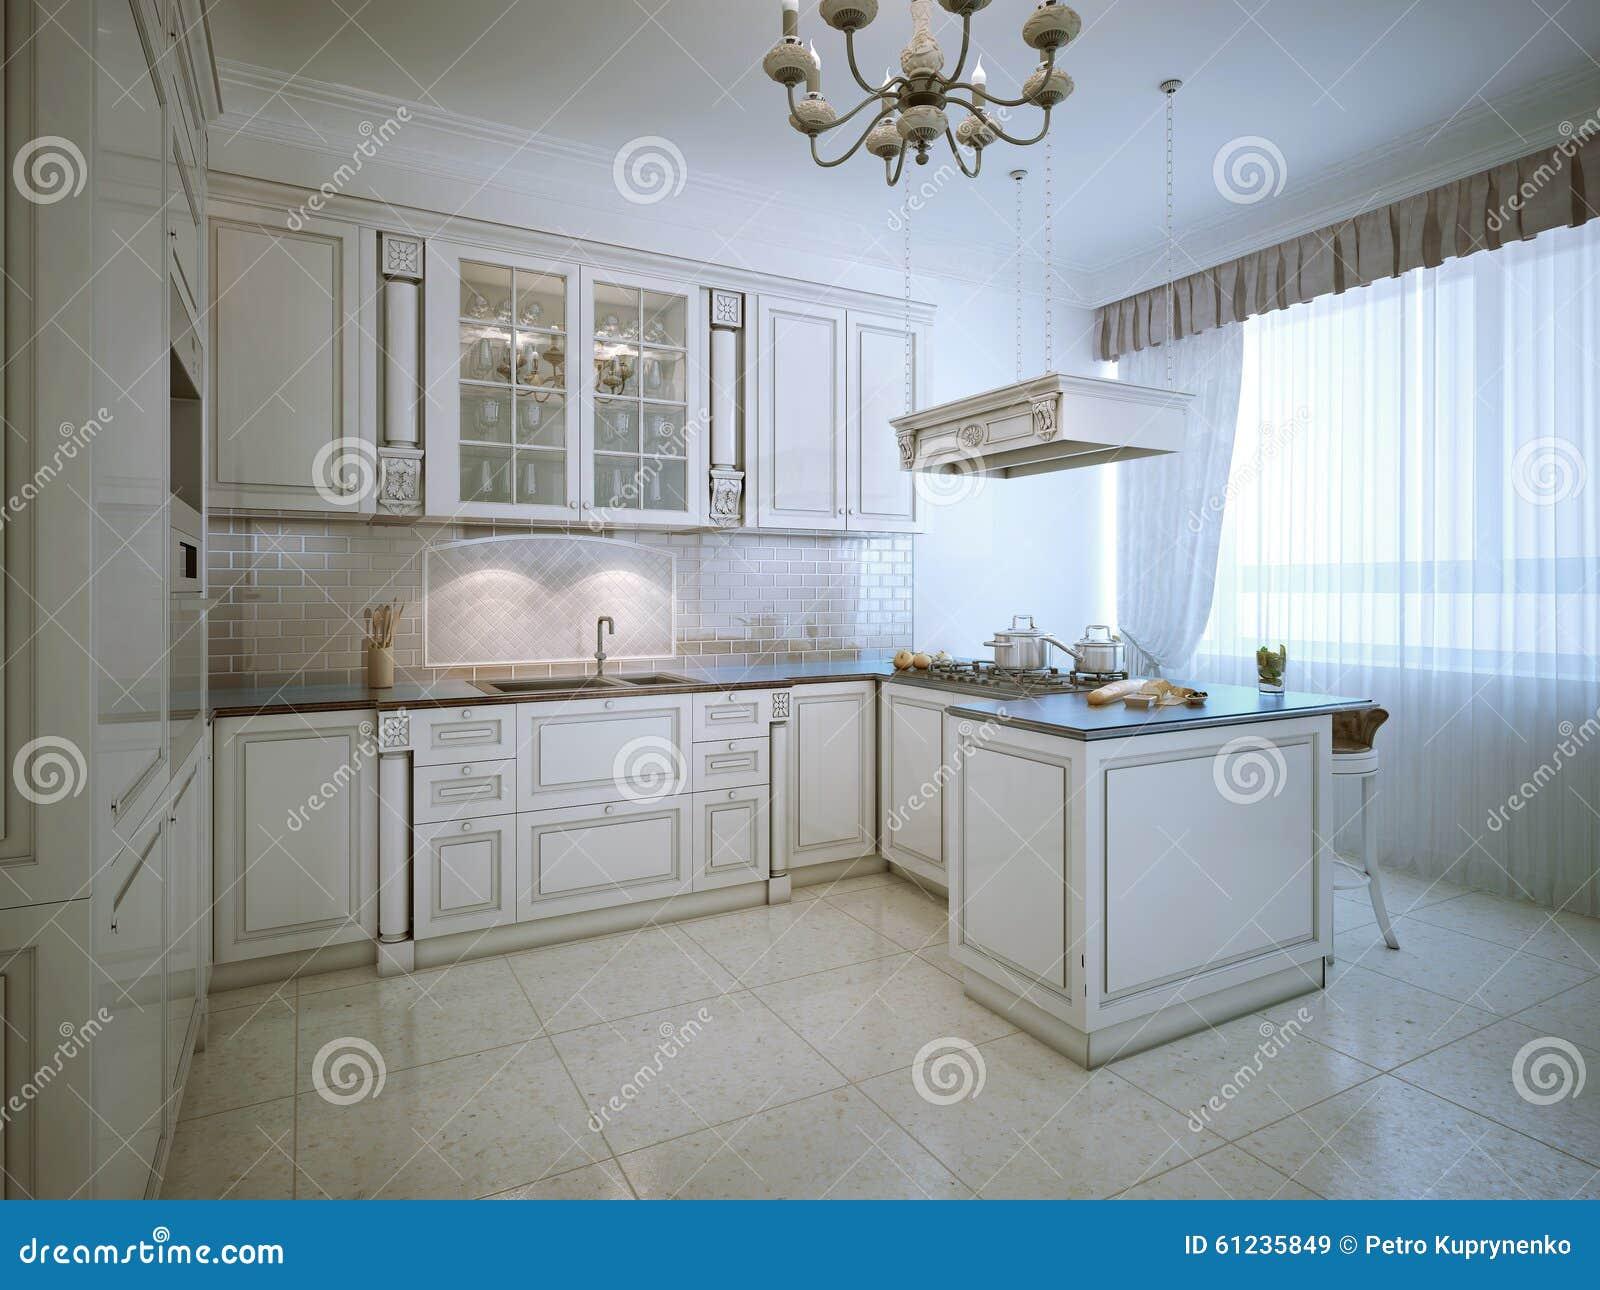 provence interior of luxury kitchen stock illustration. Black Bedroom Furniture Sets. Home Design Ideas